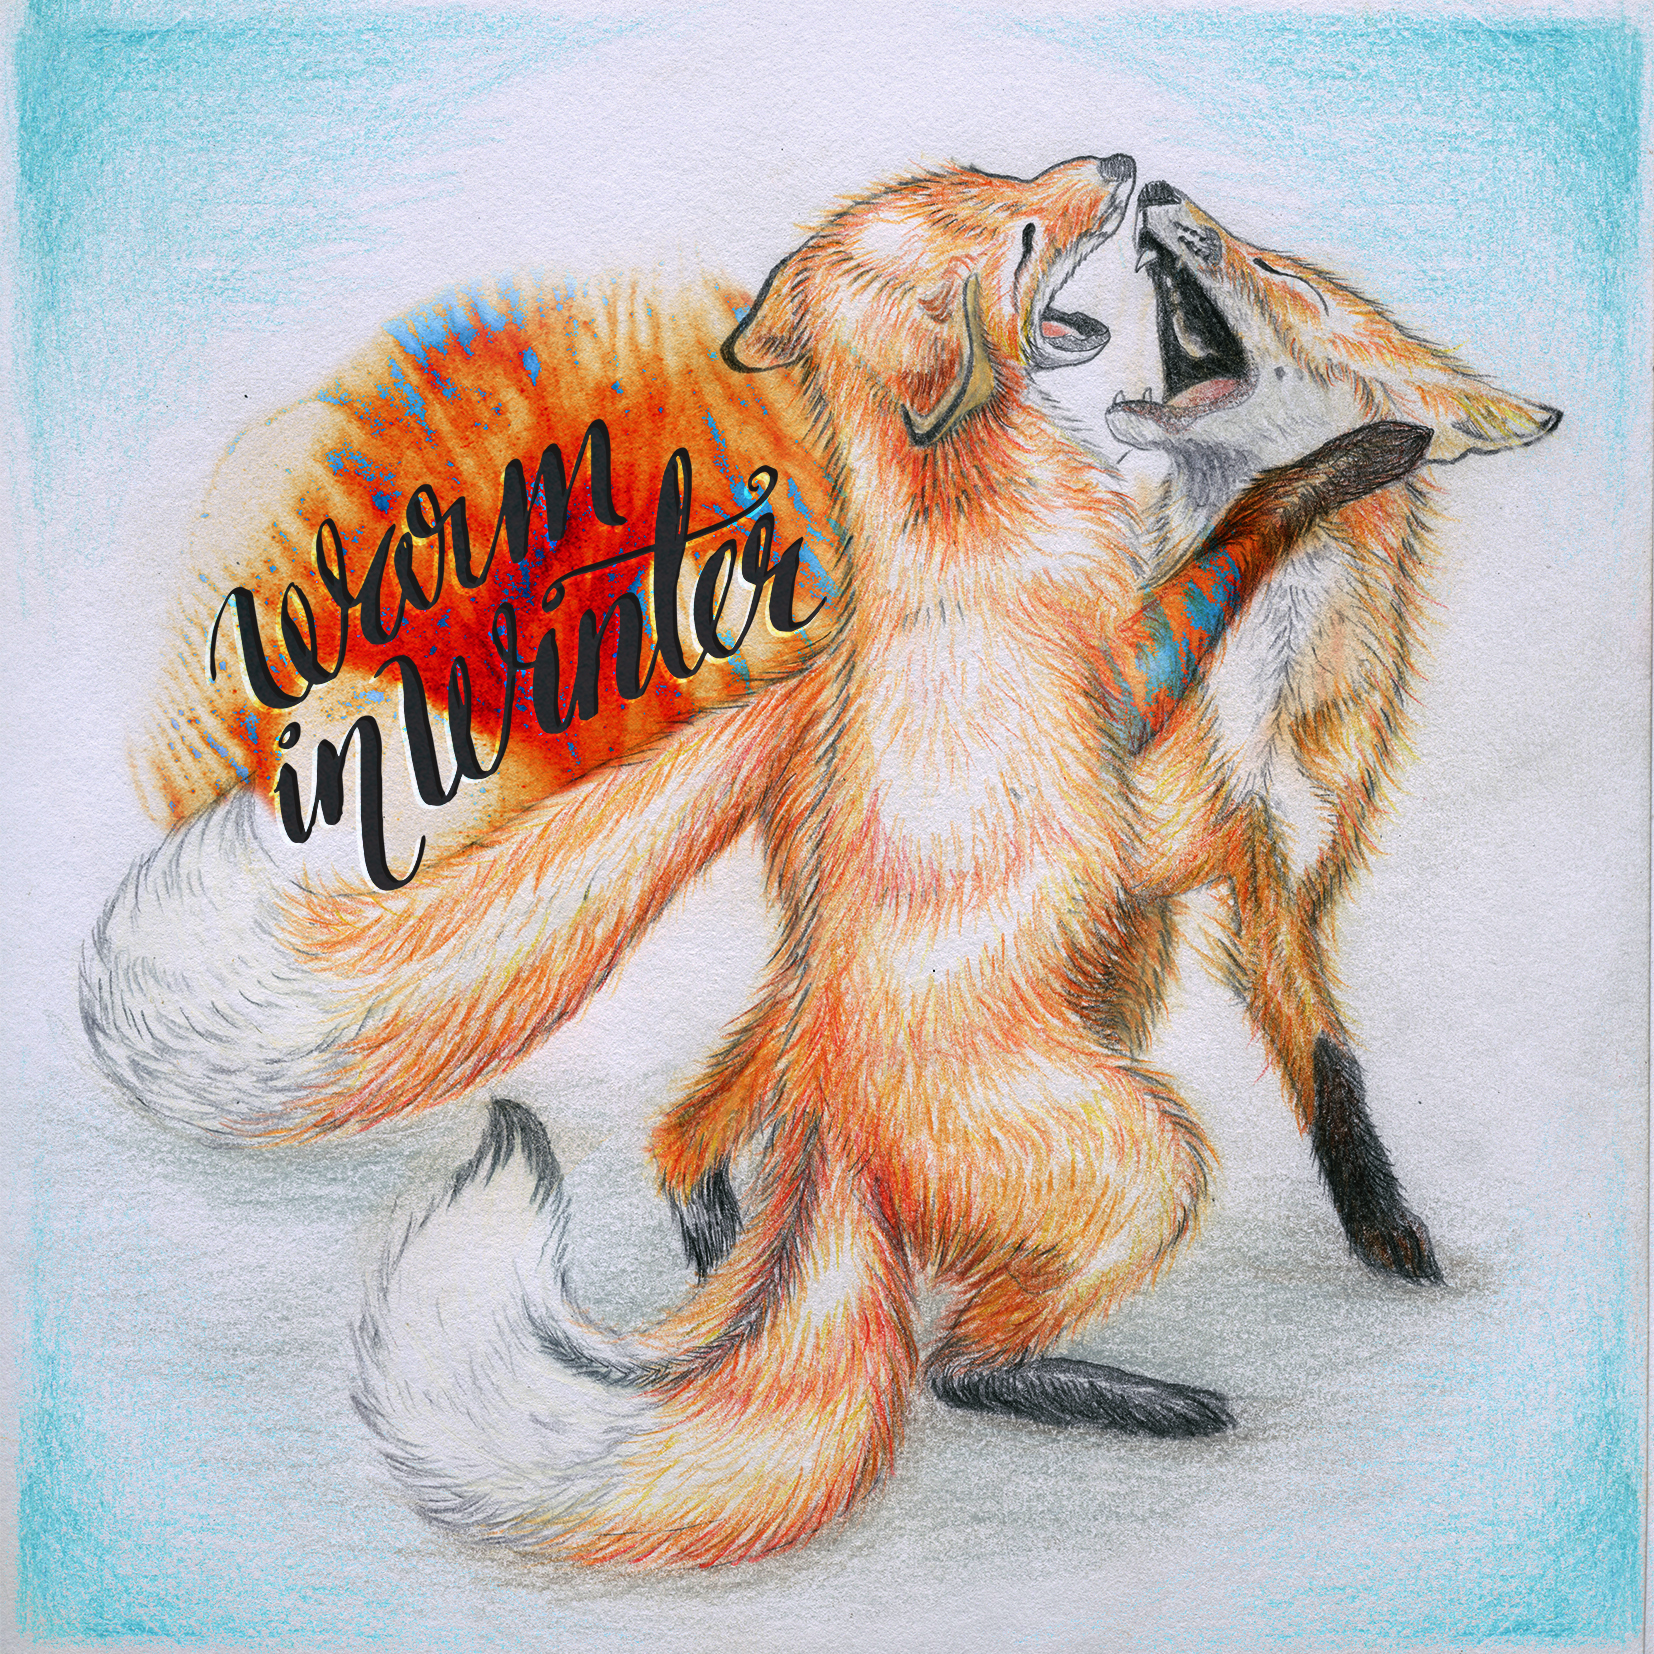 Warm in Winter single cover